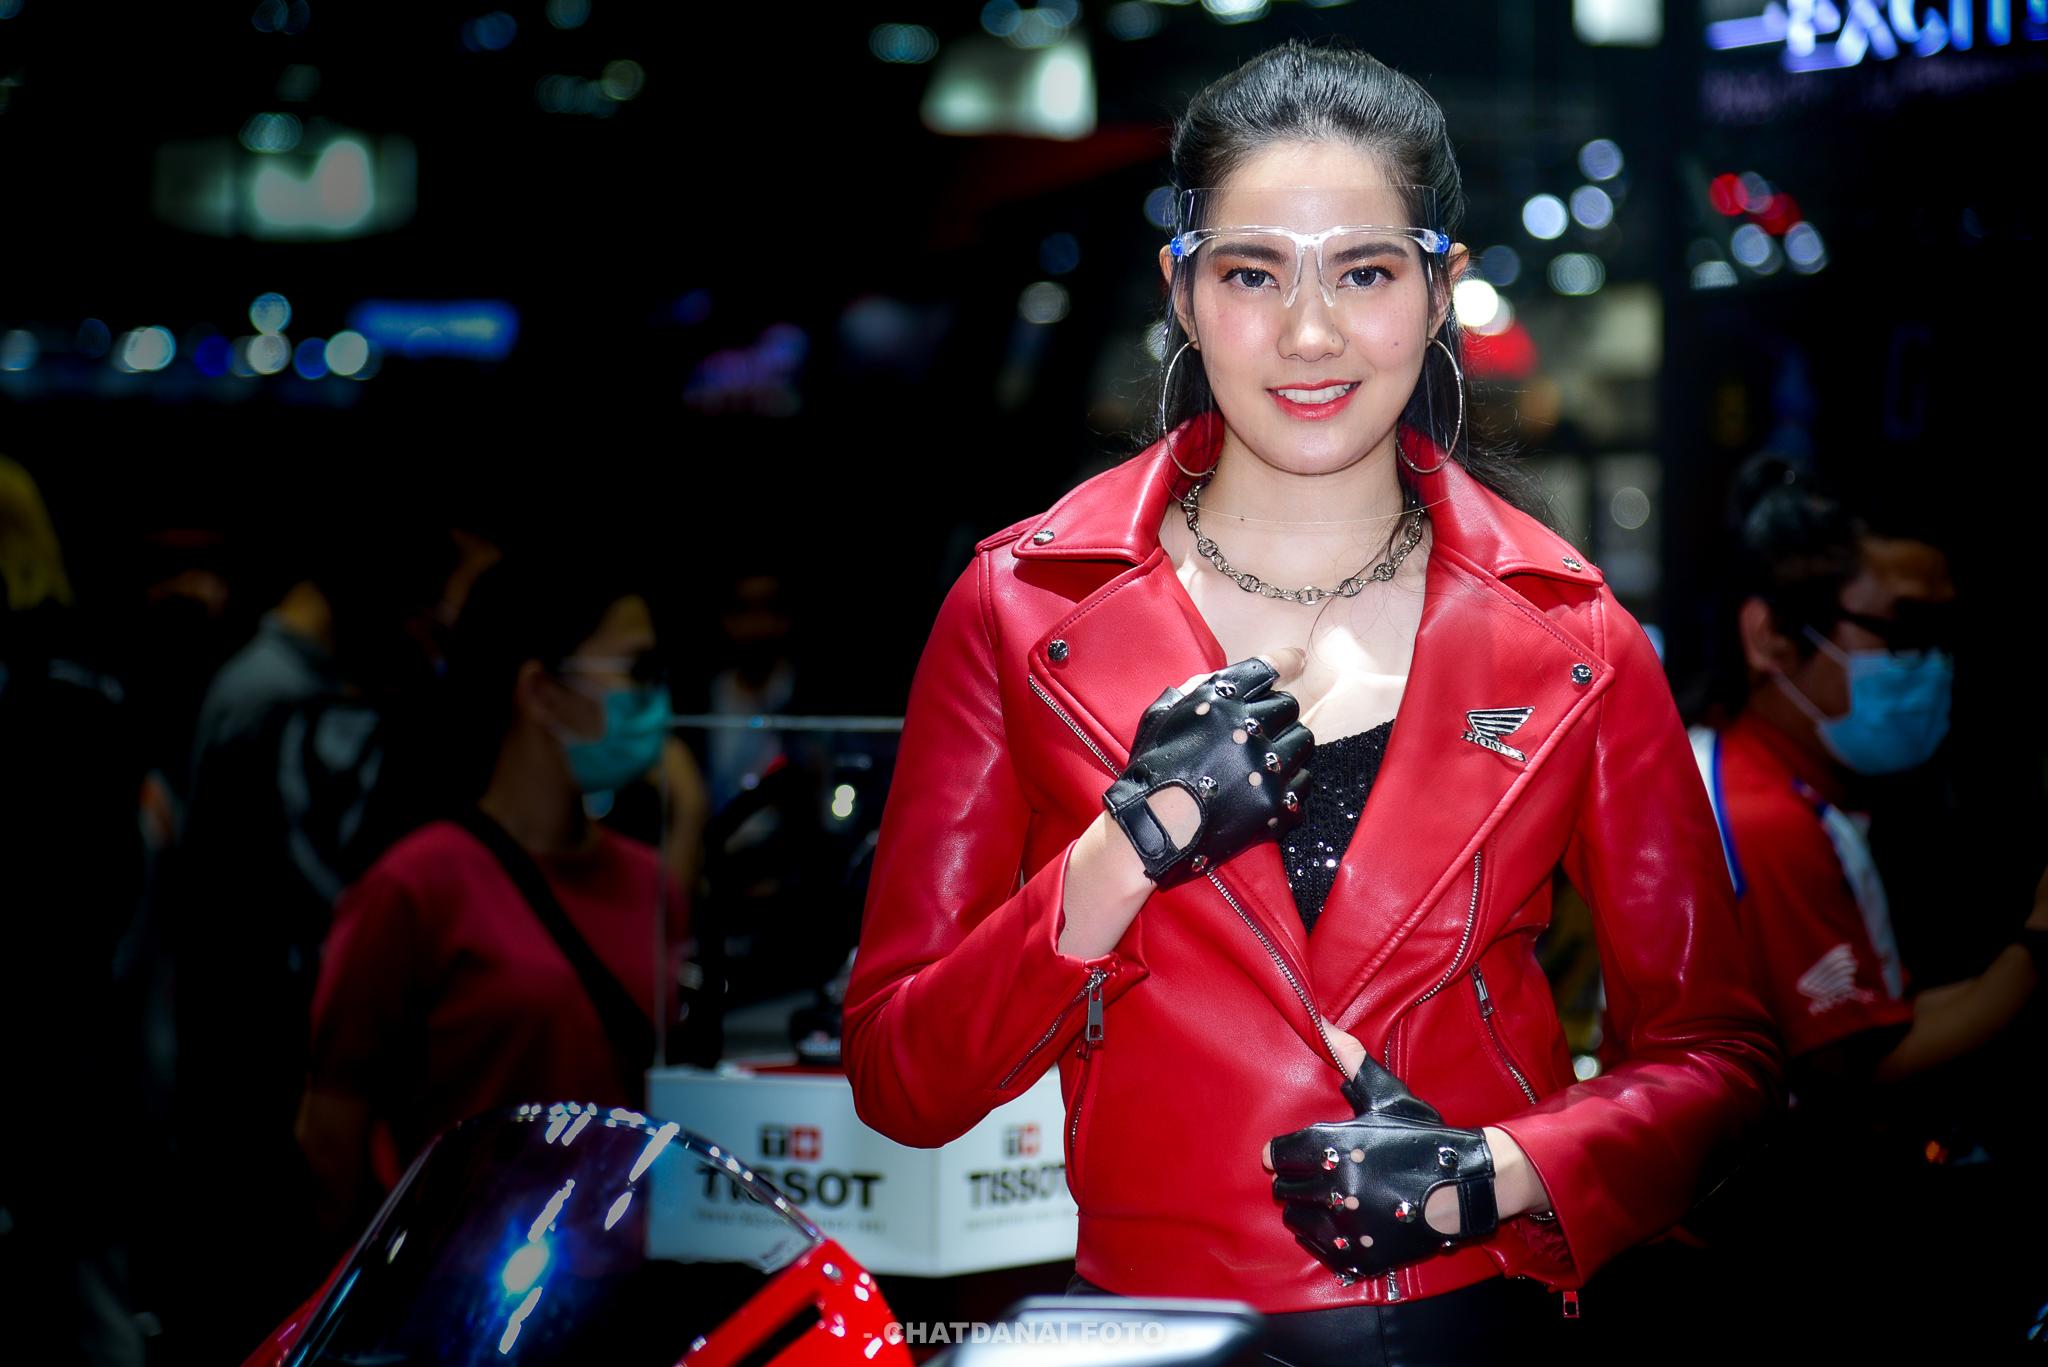 Motor Expo 2020 Motorcycle